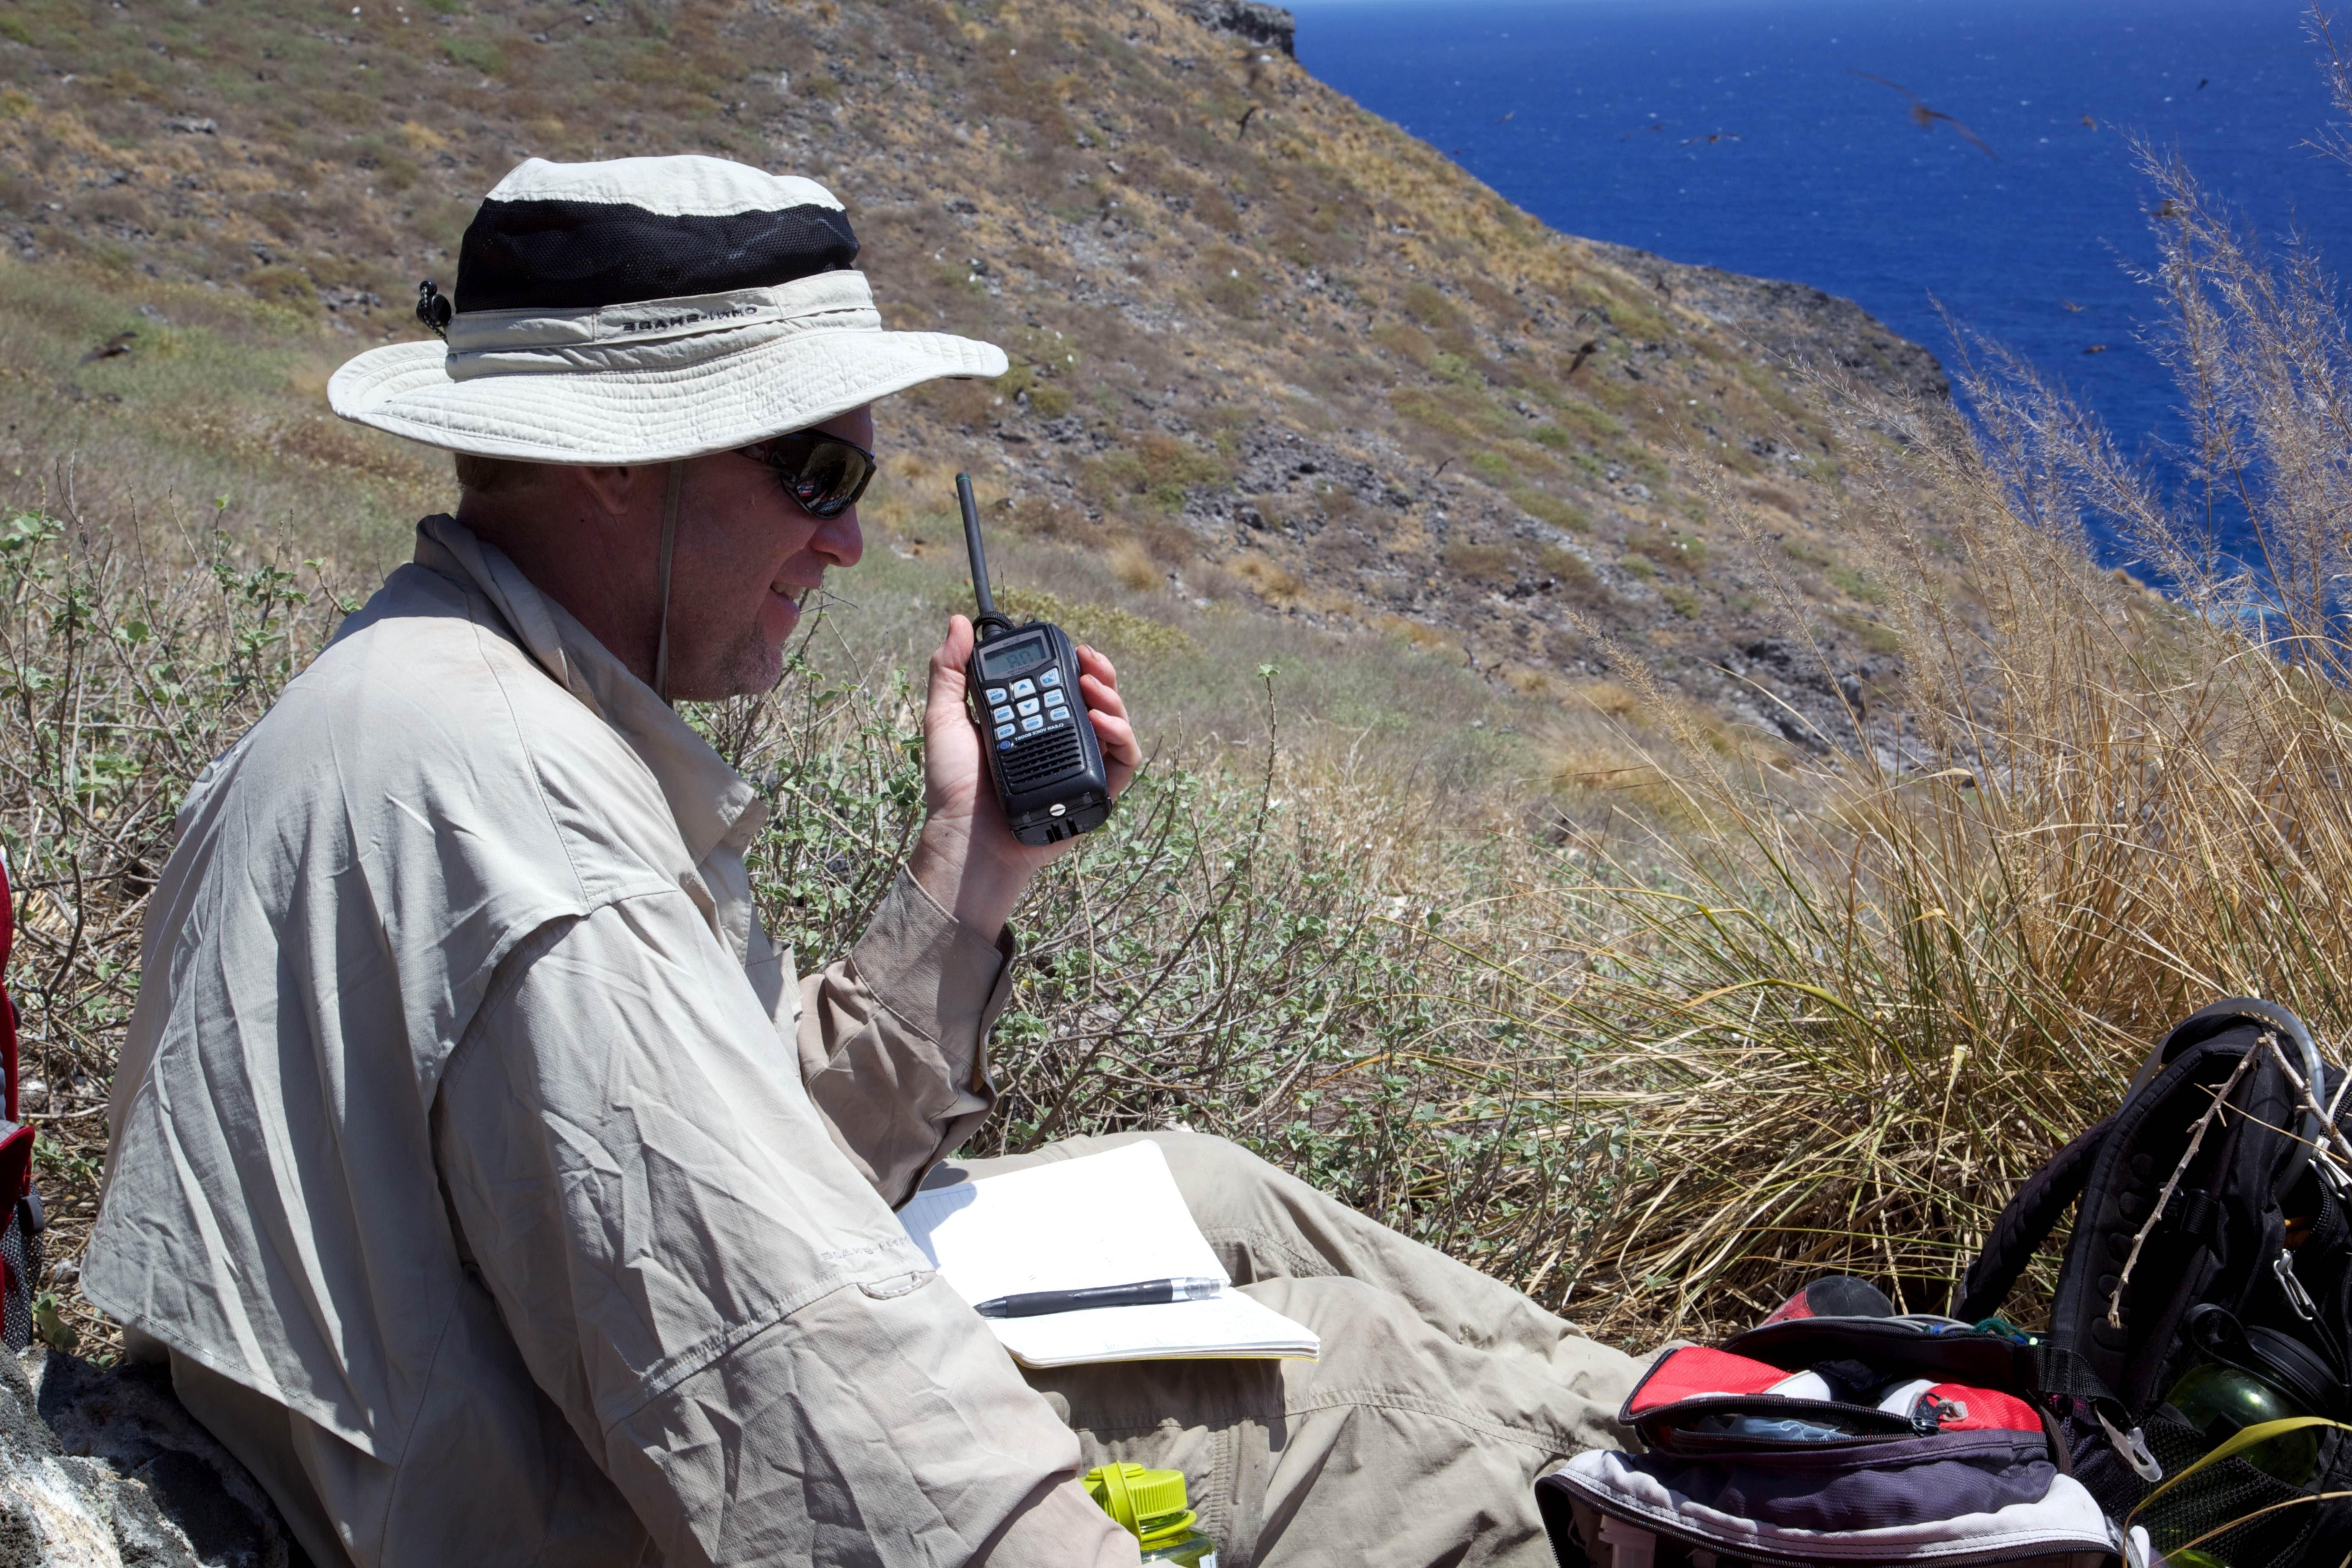 Free photograph; renger, radio, device, man, mountains